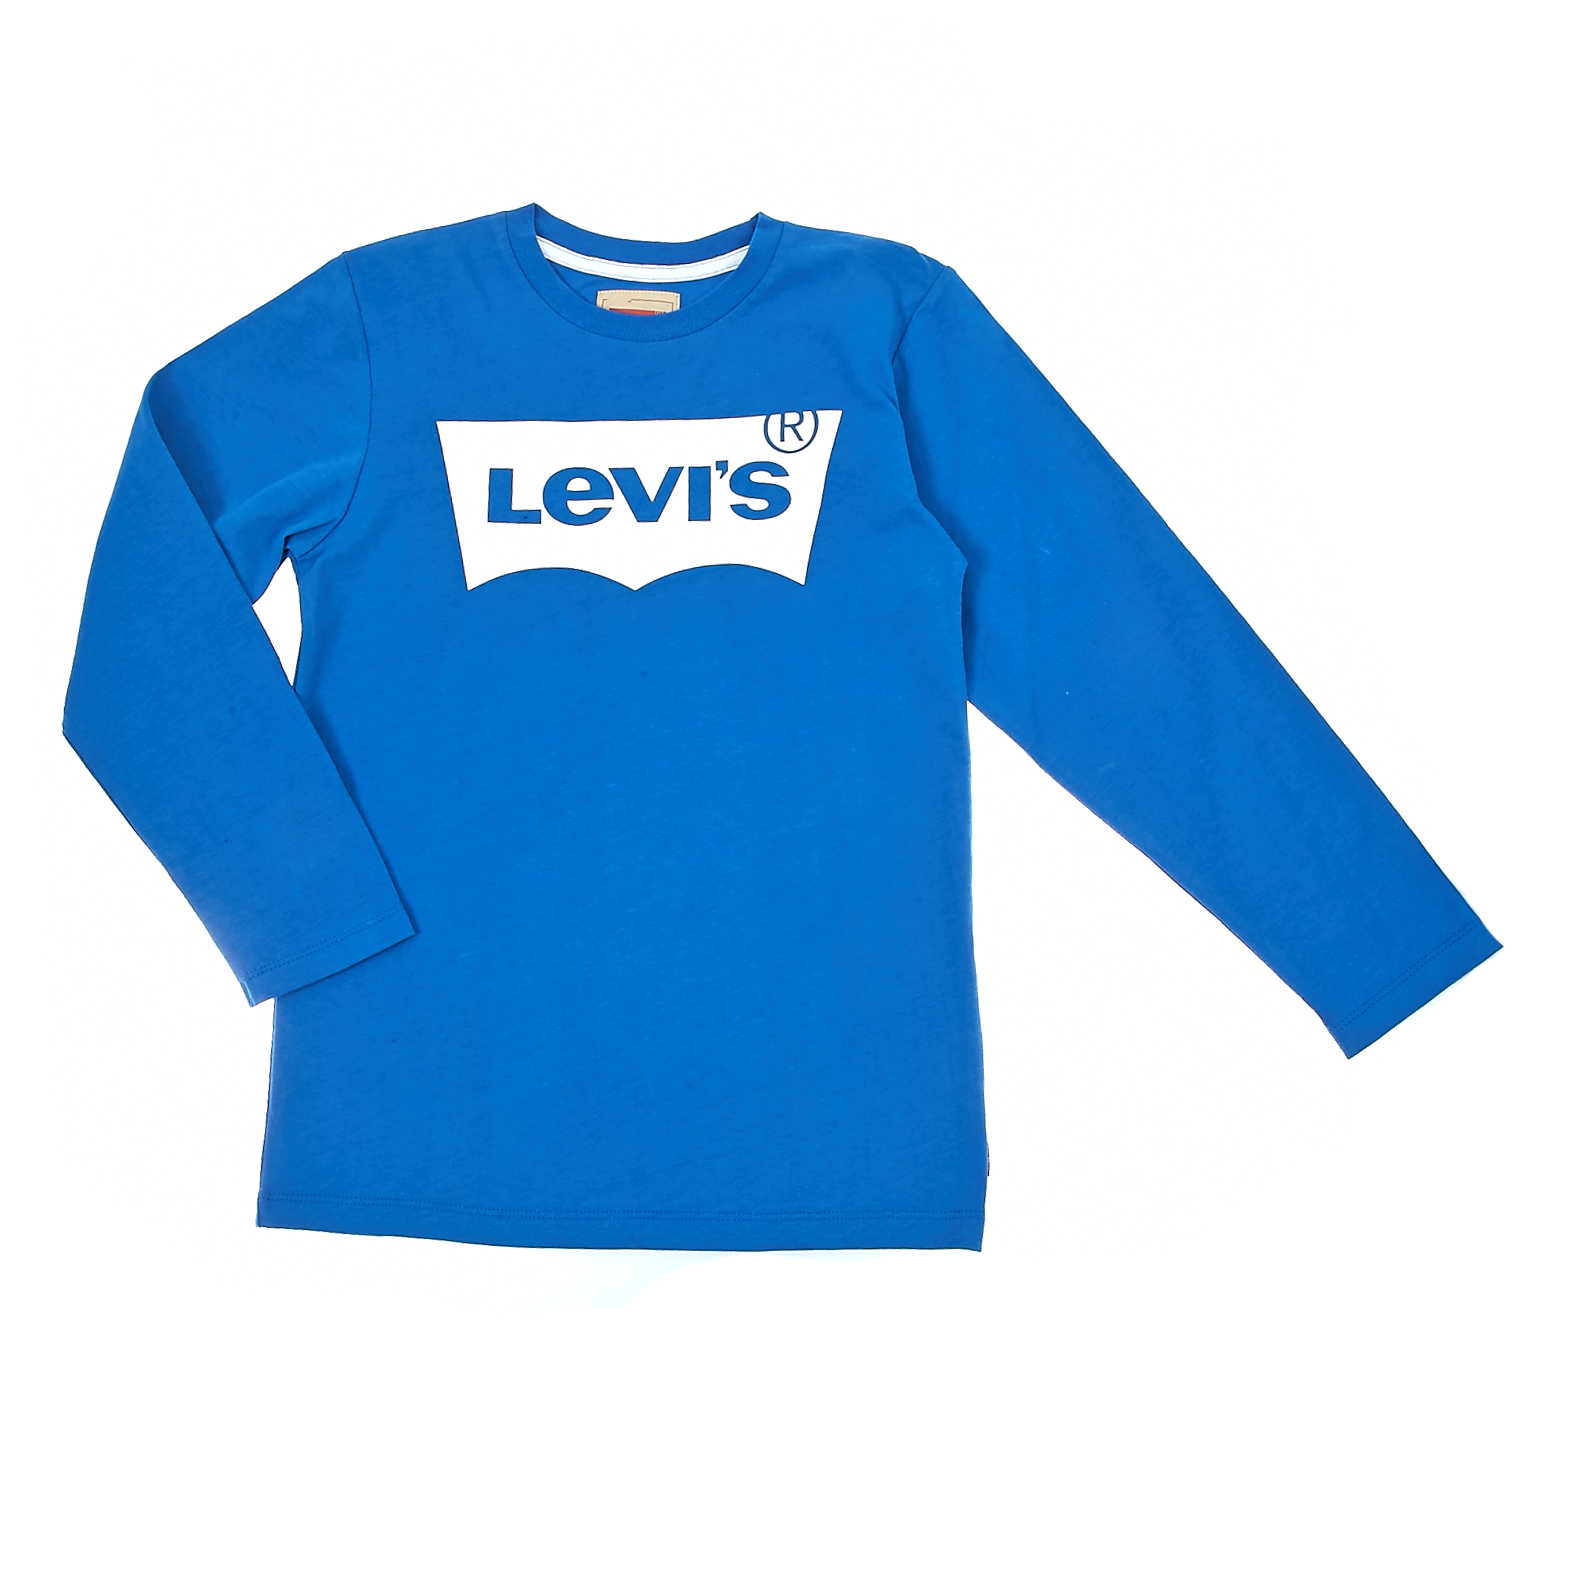 LEVI'S KIDS - Παιδική μπλούζα Levi's Kids μπλε